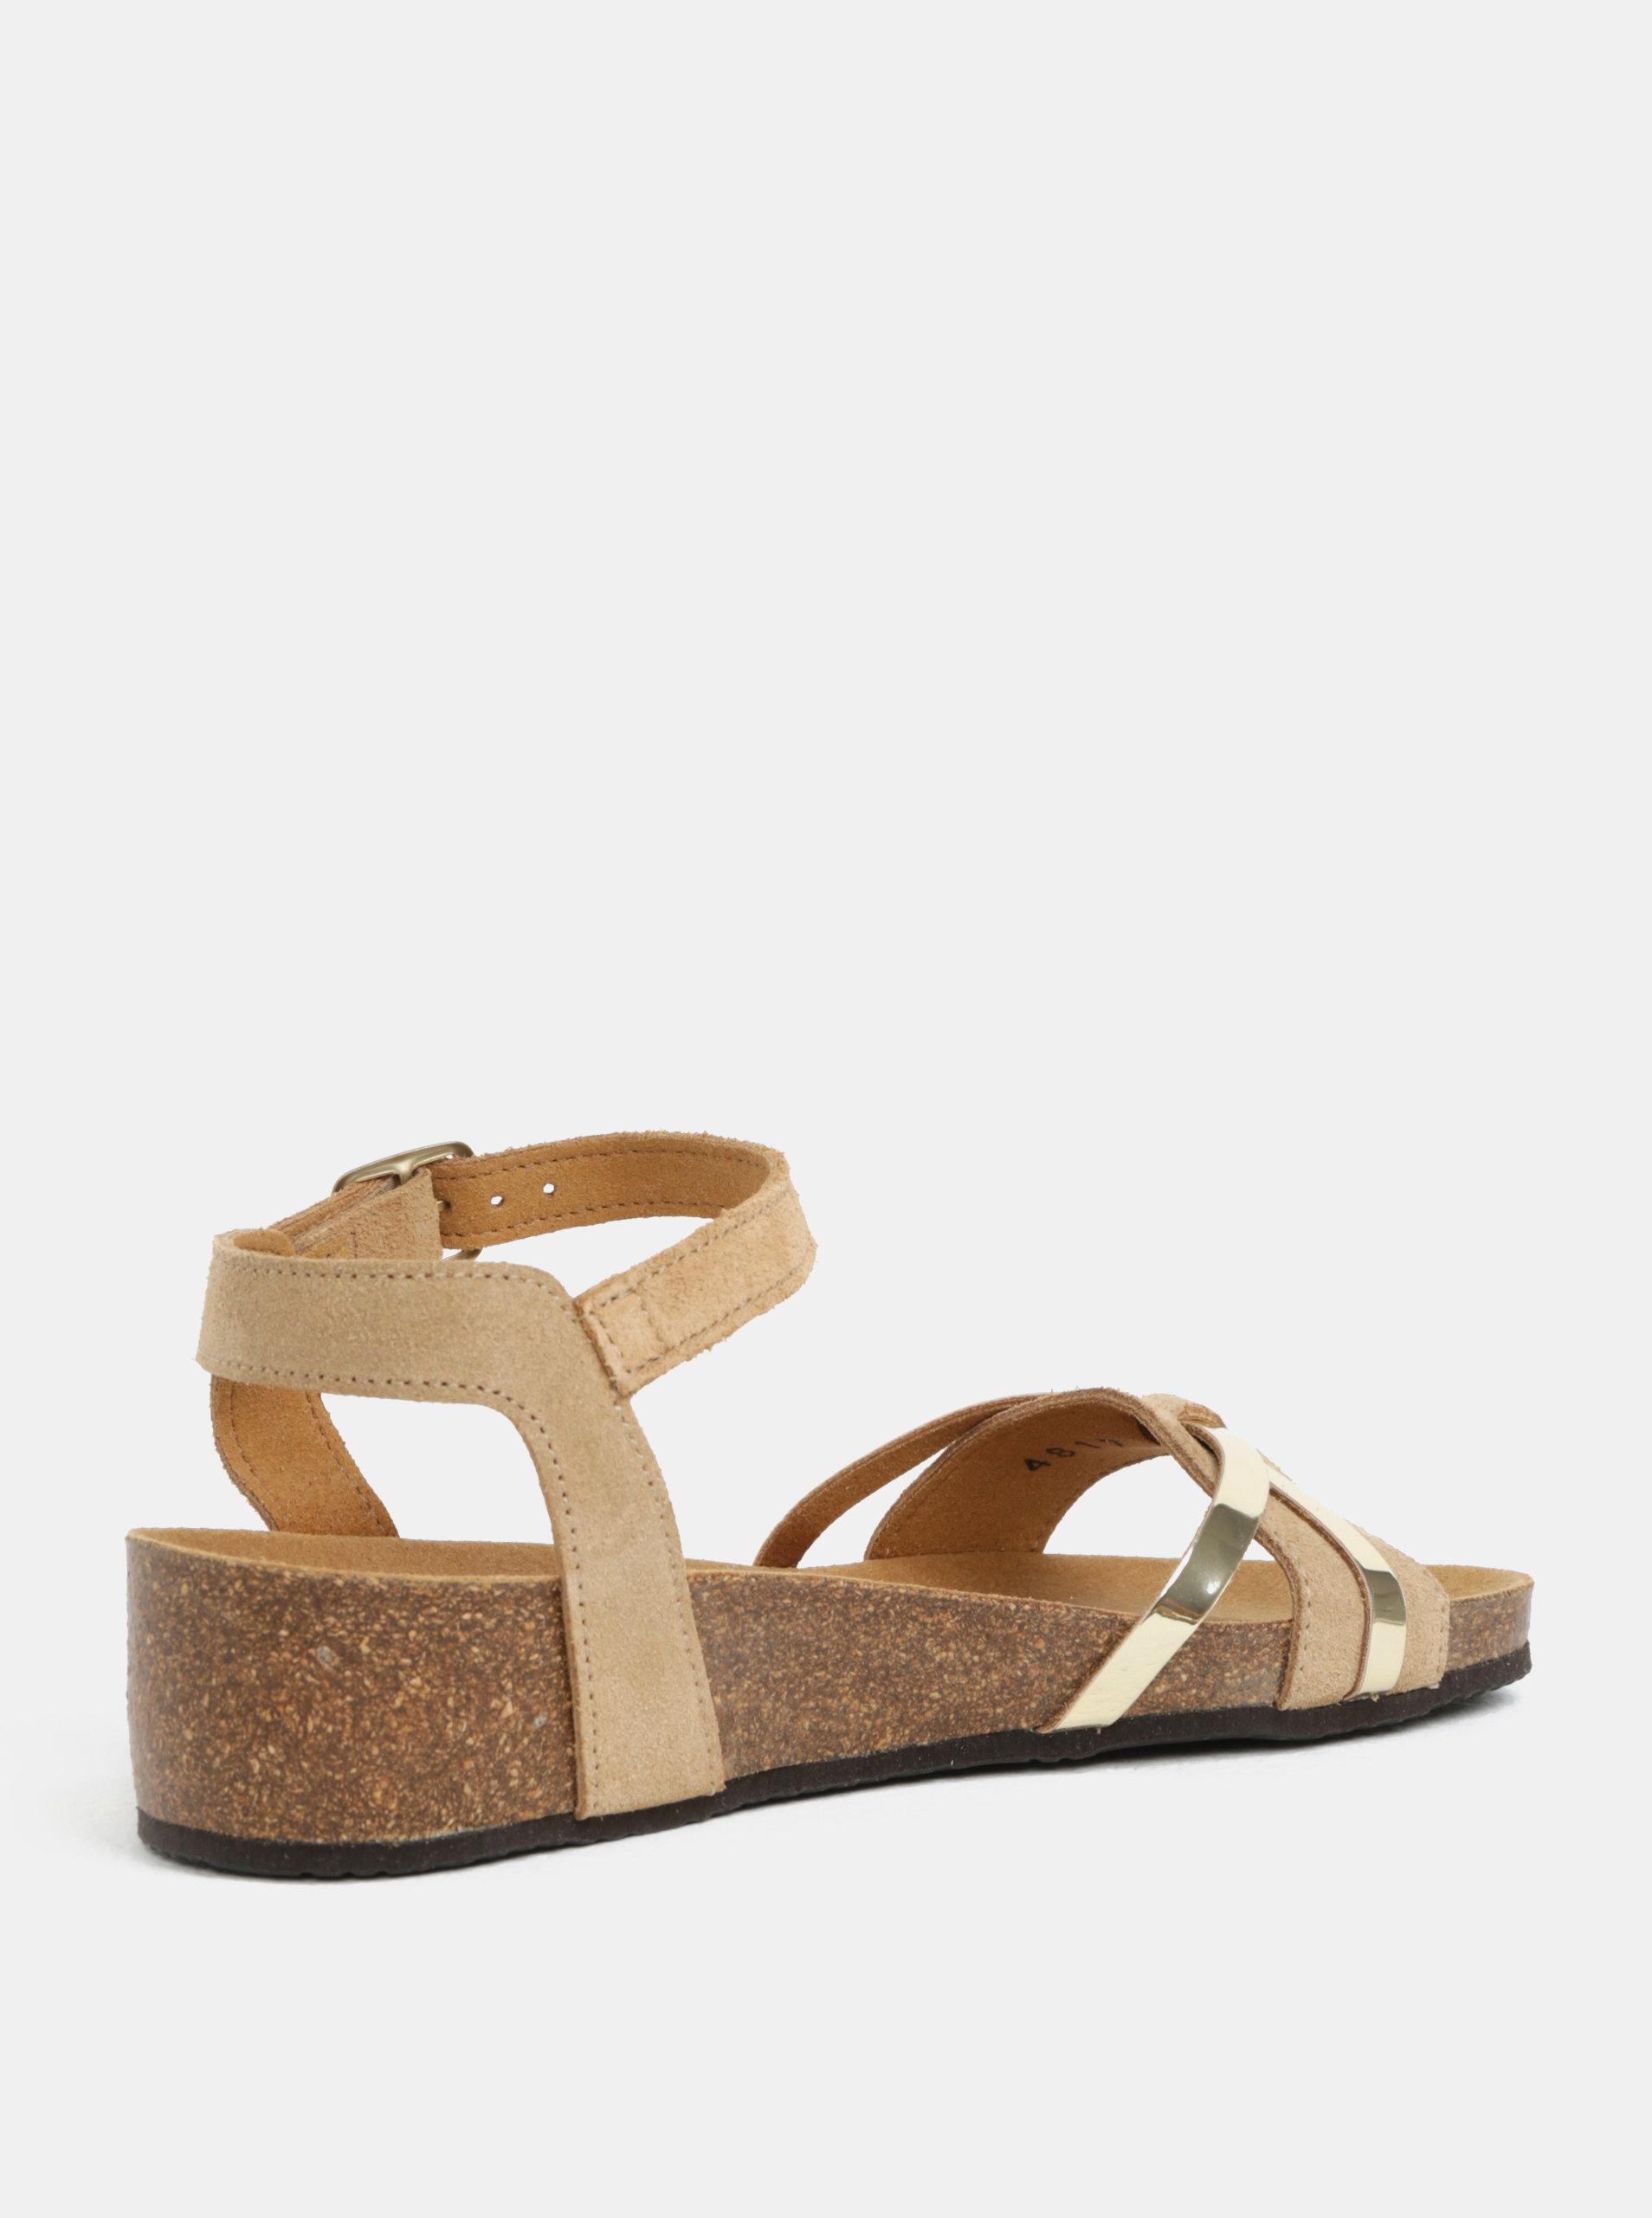 df44edc6d432 Hnedé dámske semišové zdravotné sandále Scholl Kelly ...